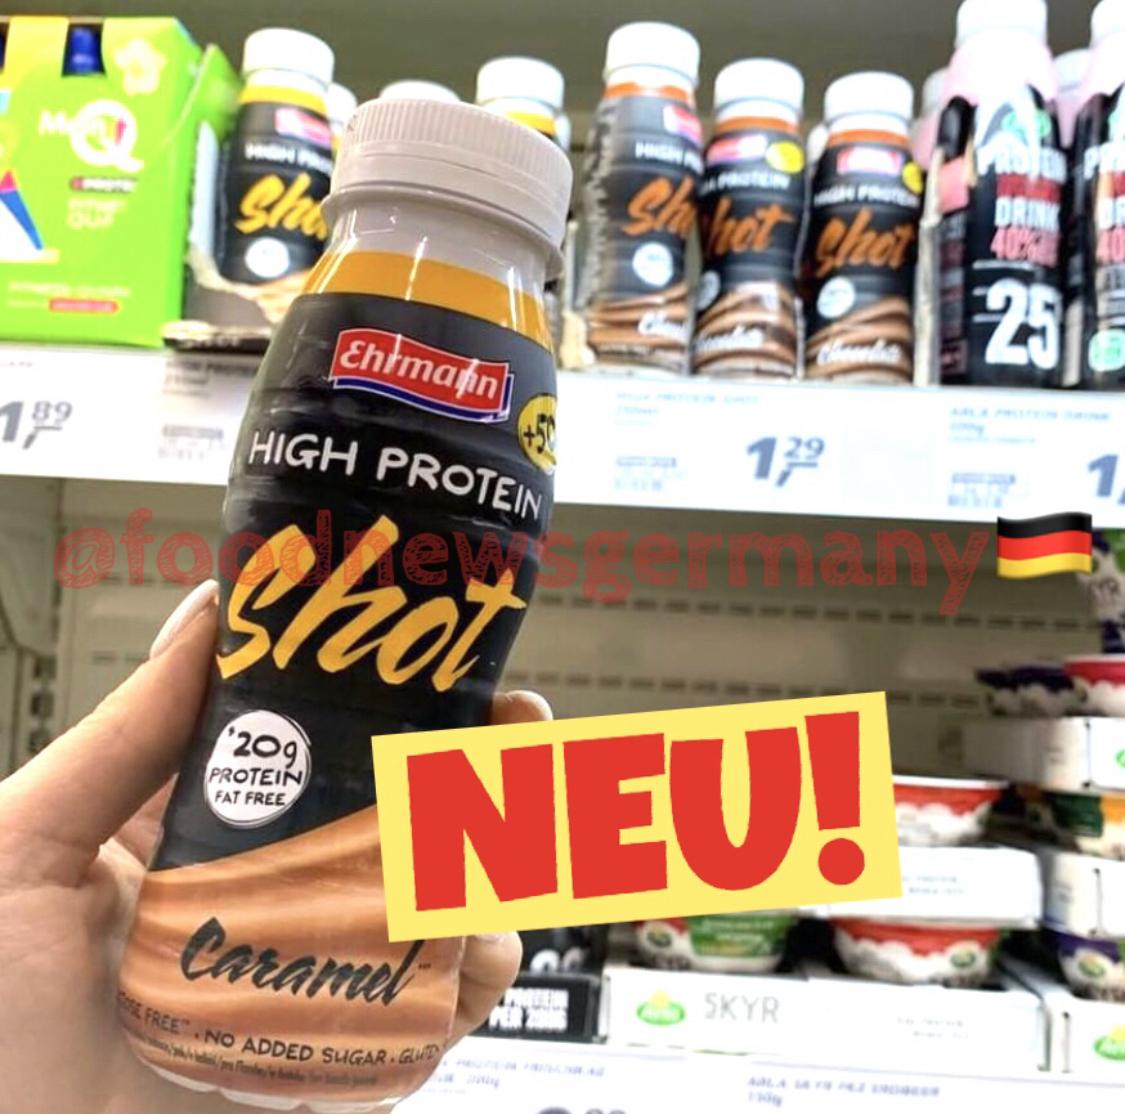 Ehrmann High Protein Shot Caramel